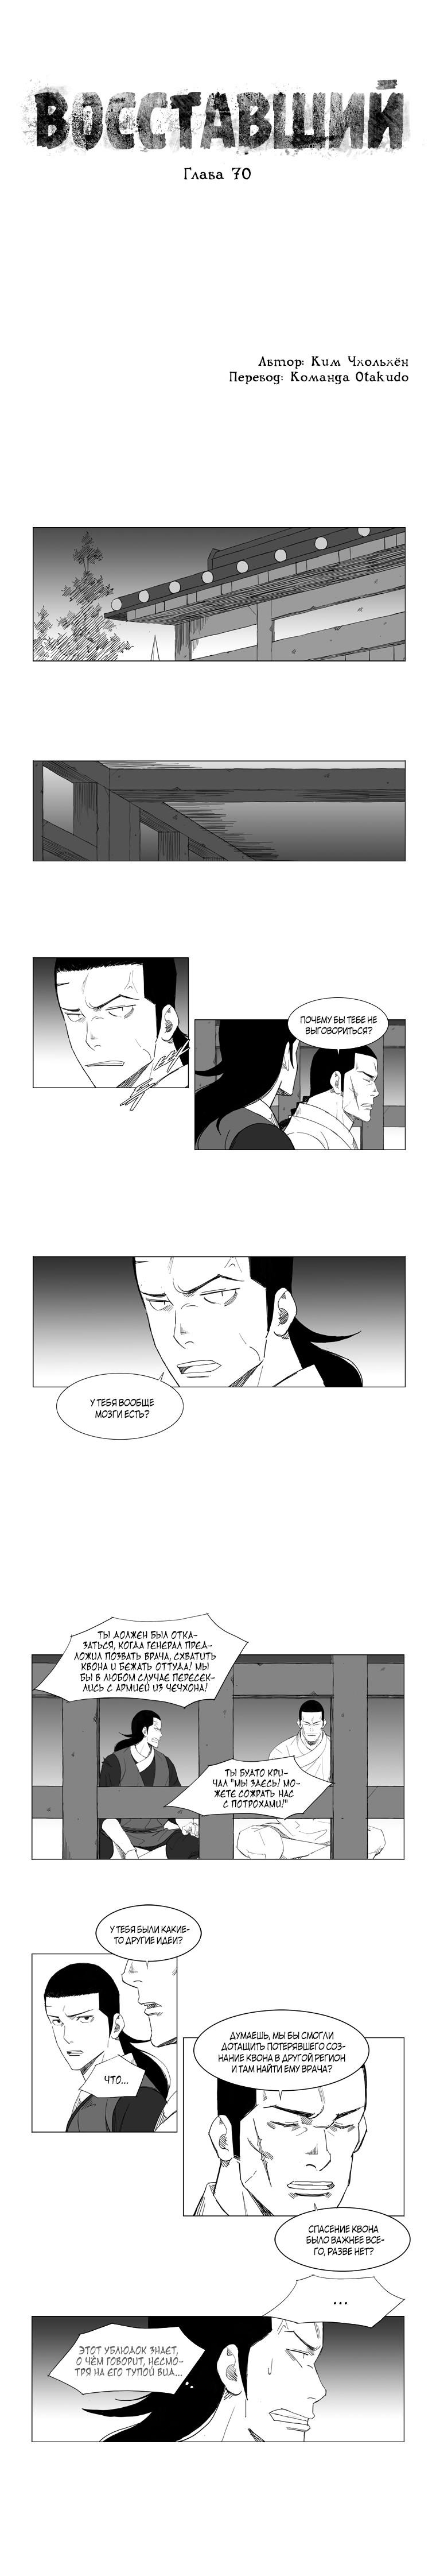 https://r1.ninemanga.com/comics/pic2/39/28263/331930/1502975990125.jpg Page 1